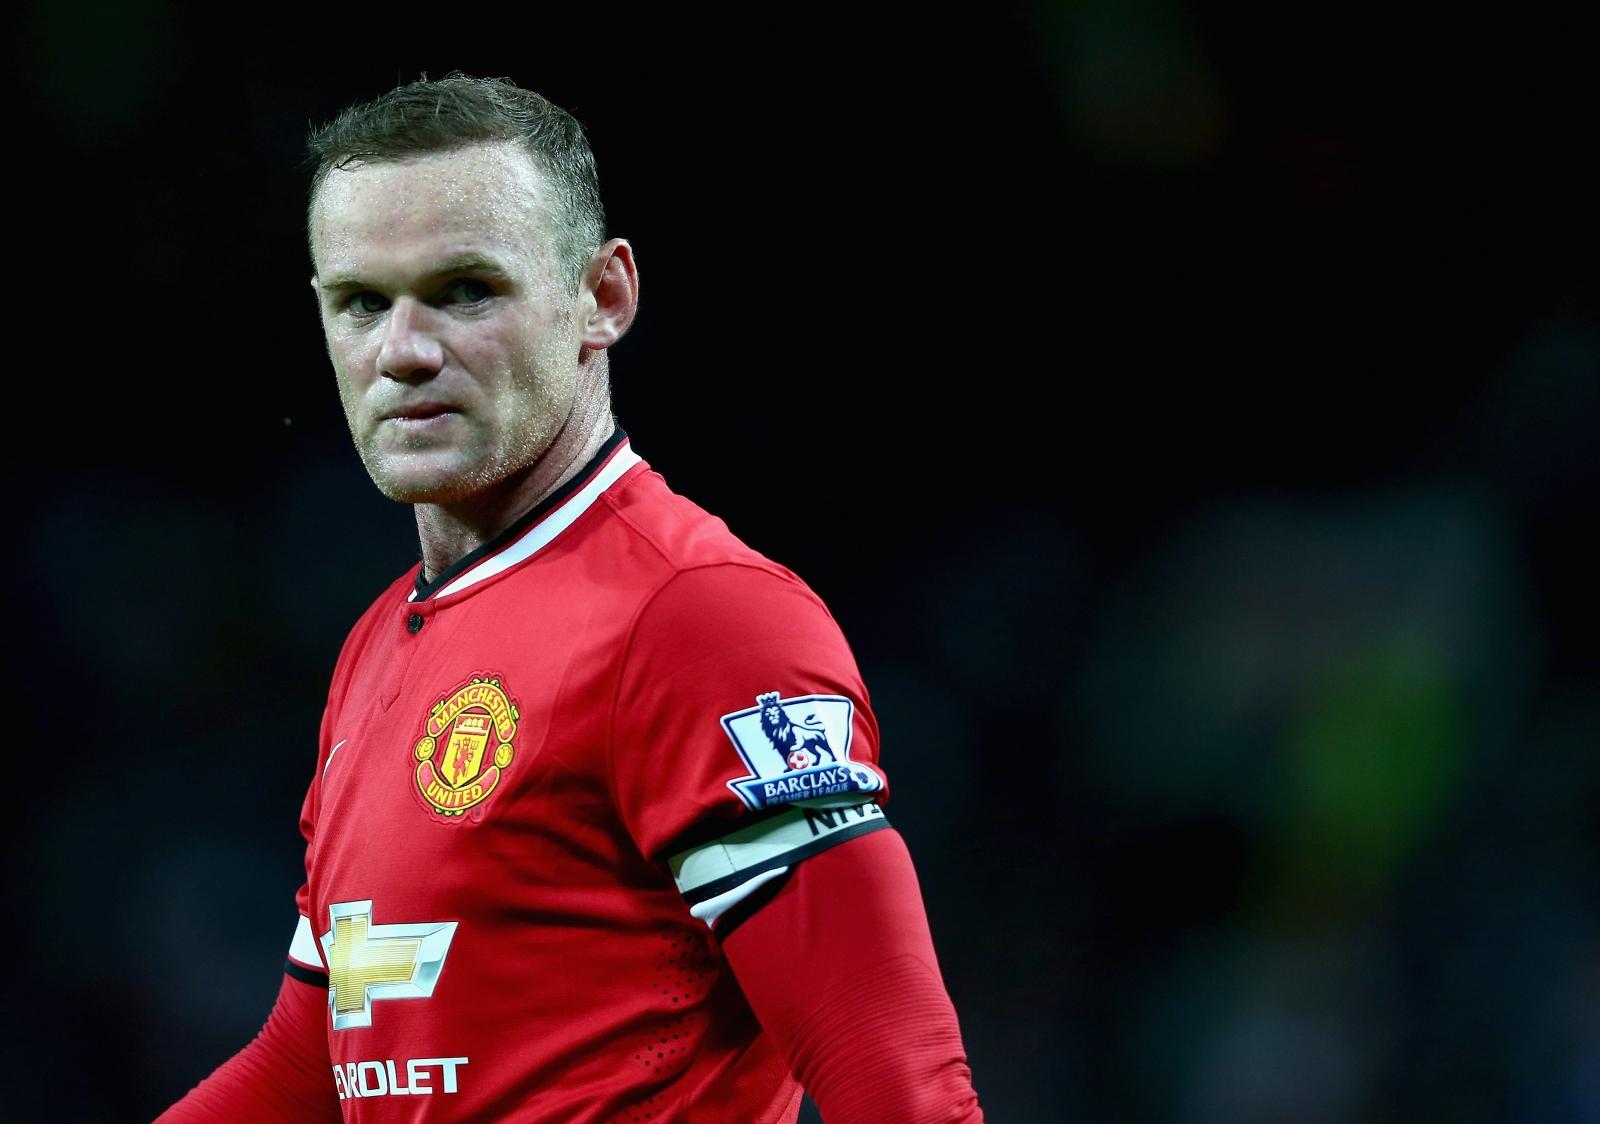 wayne rooney named manchester united captain